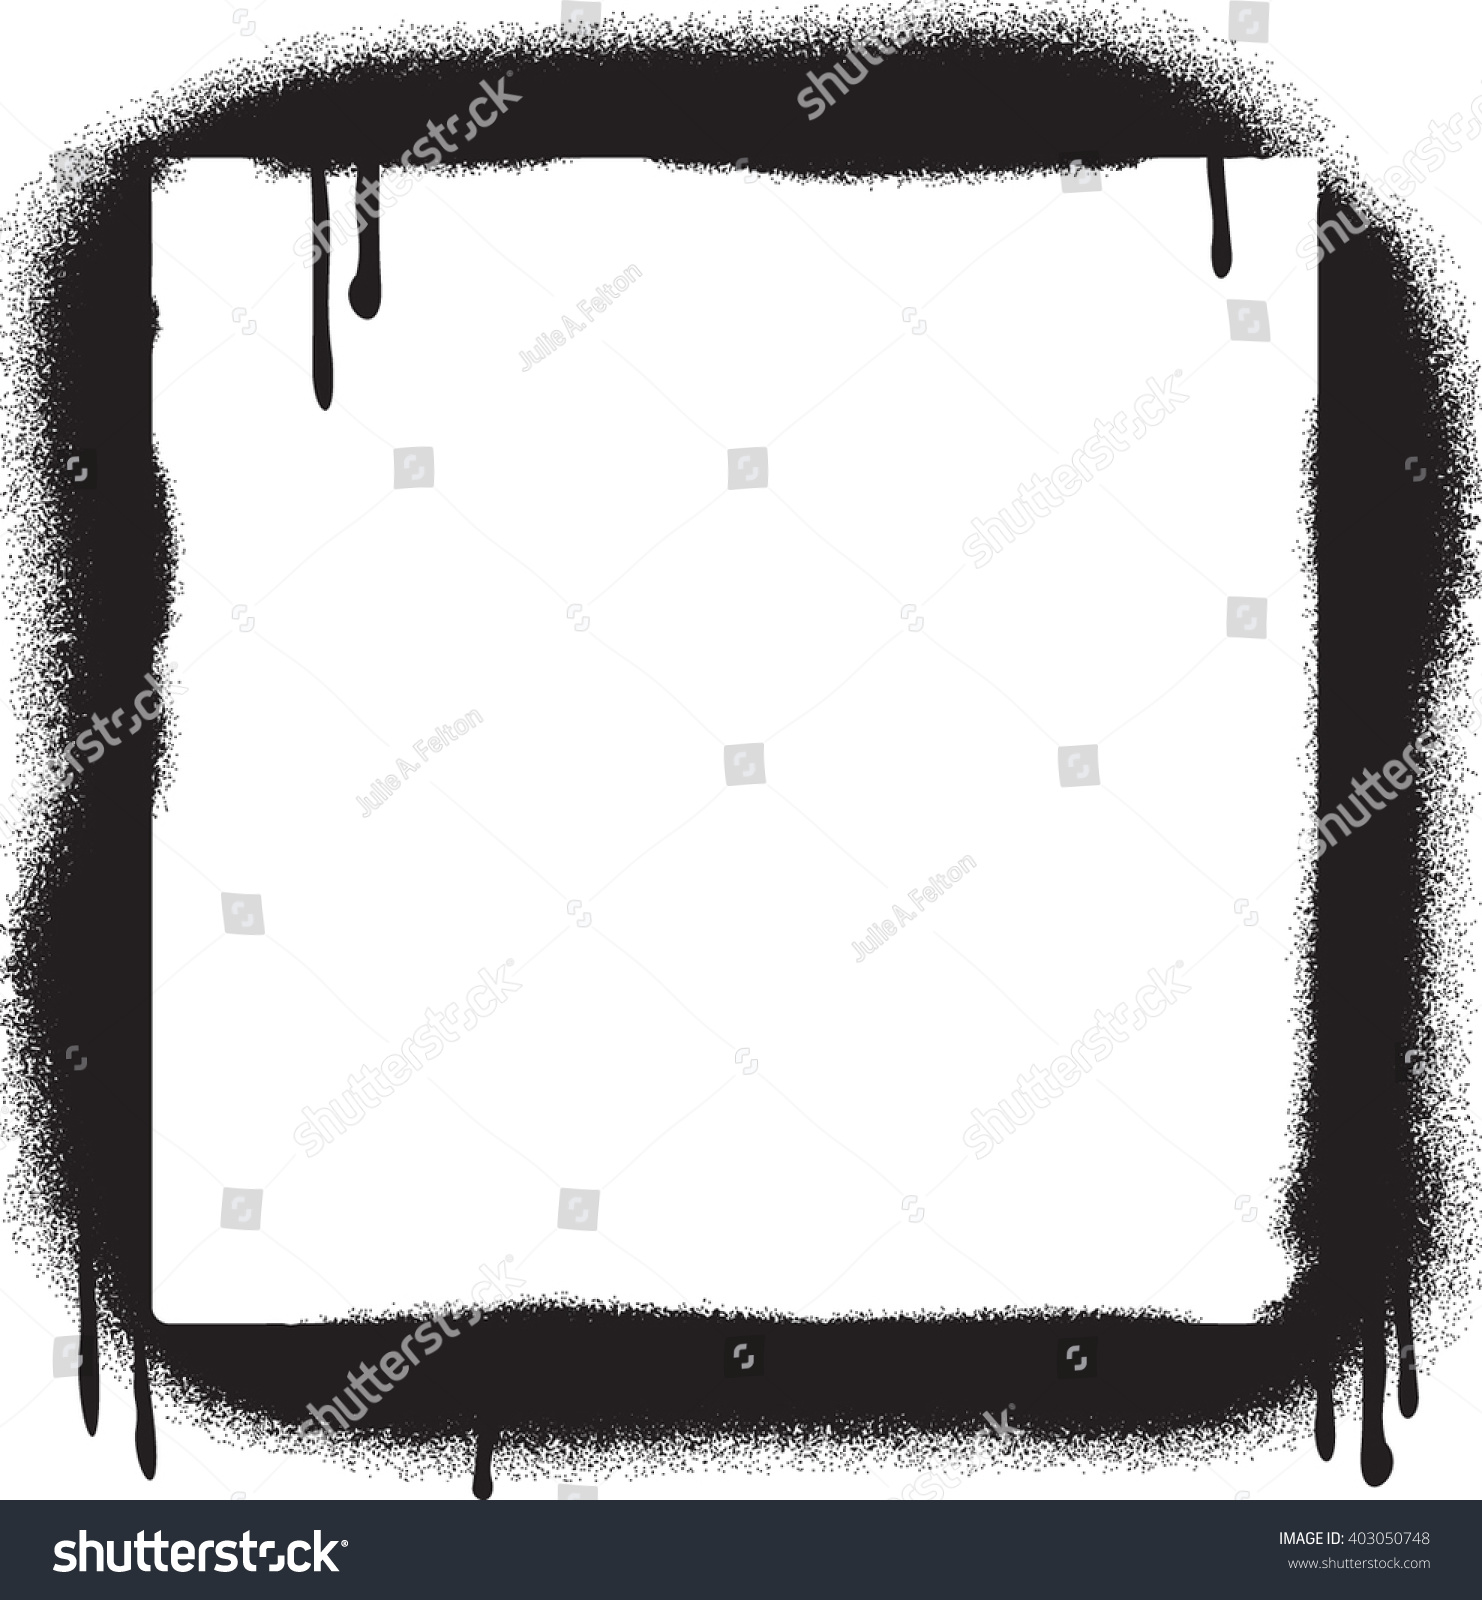 Grunge Graffiti Spray Paint Border Frame Stock-Vektorgrafik ...